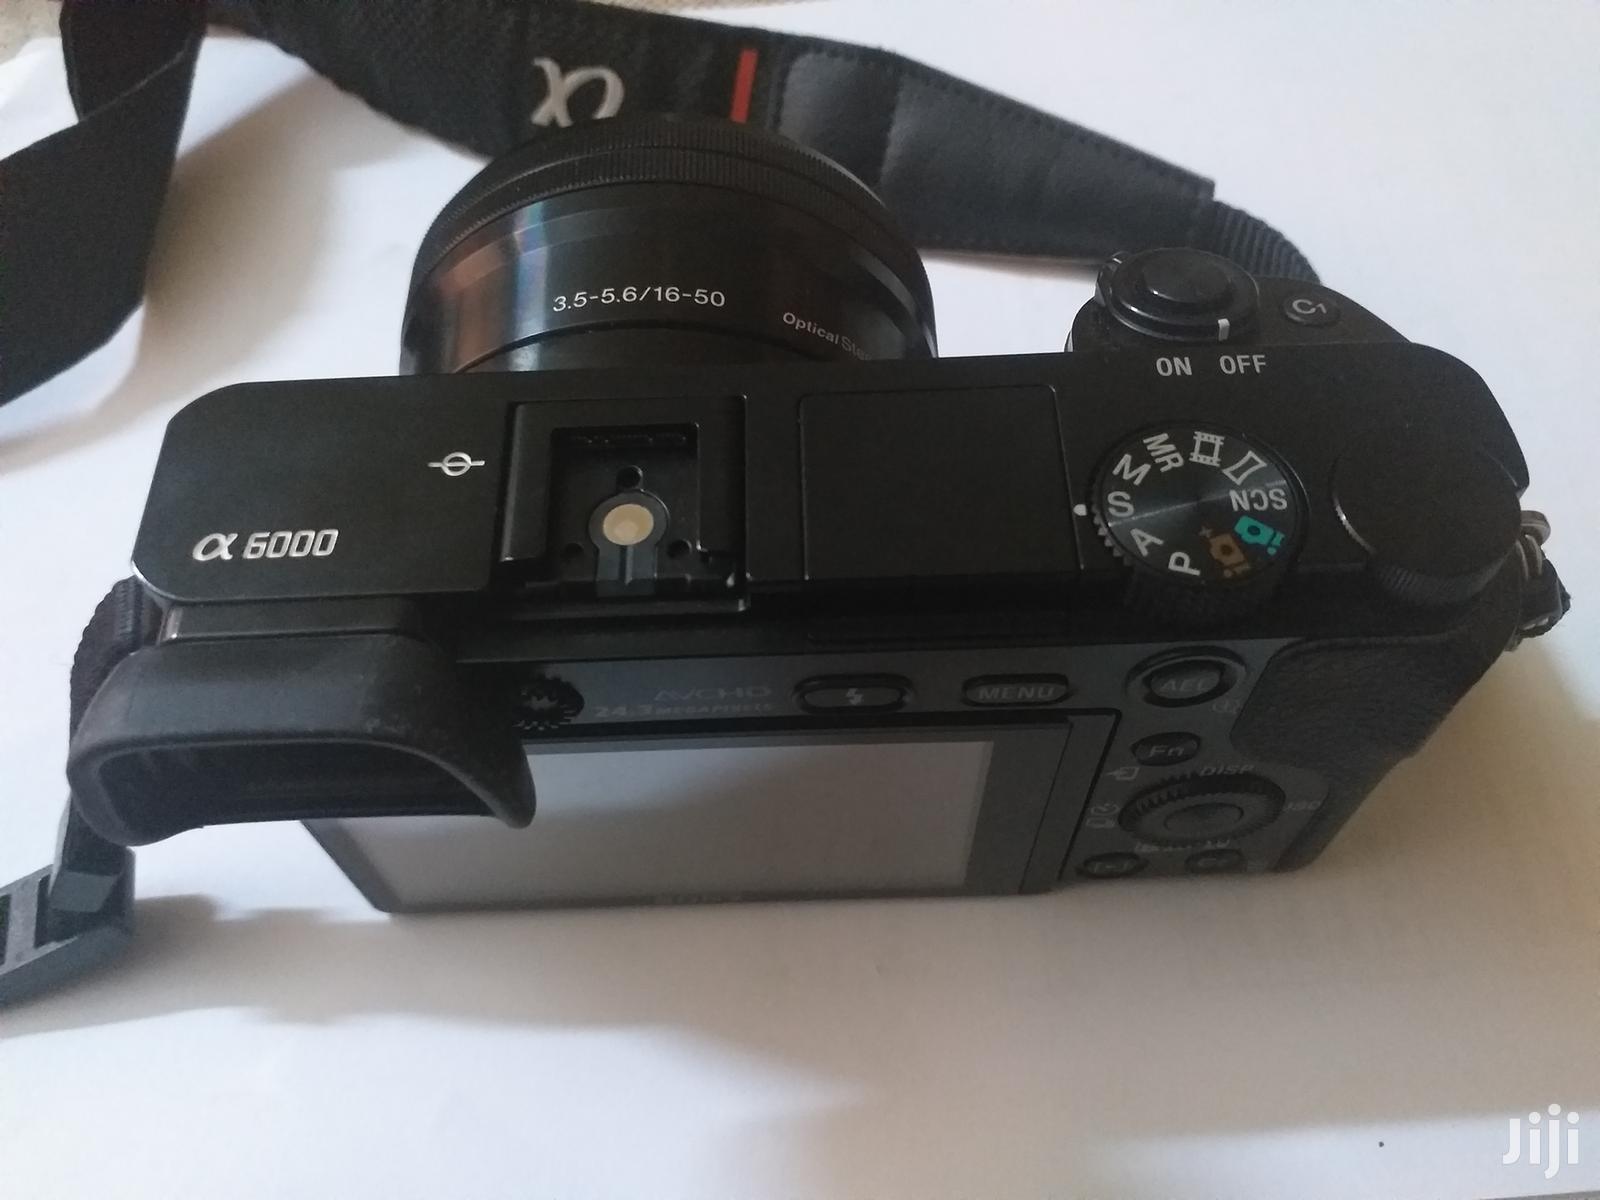 Sony A6000 Mirrorless Camera | Photo & Video Cameras for sale in Nyali (Mkomani), Mombasa, Kenya